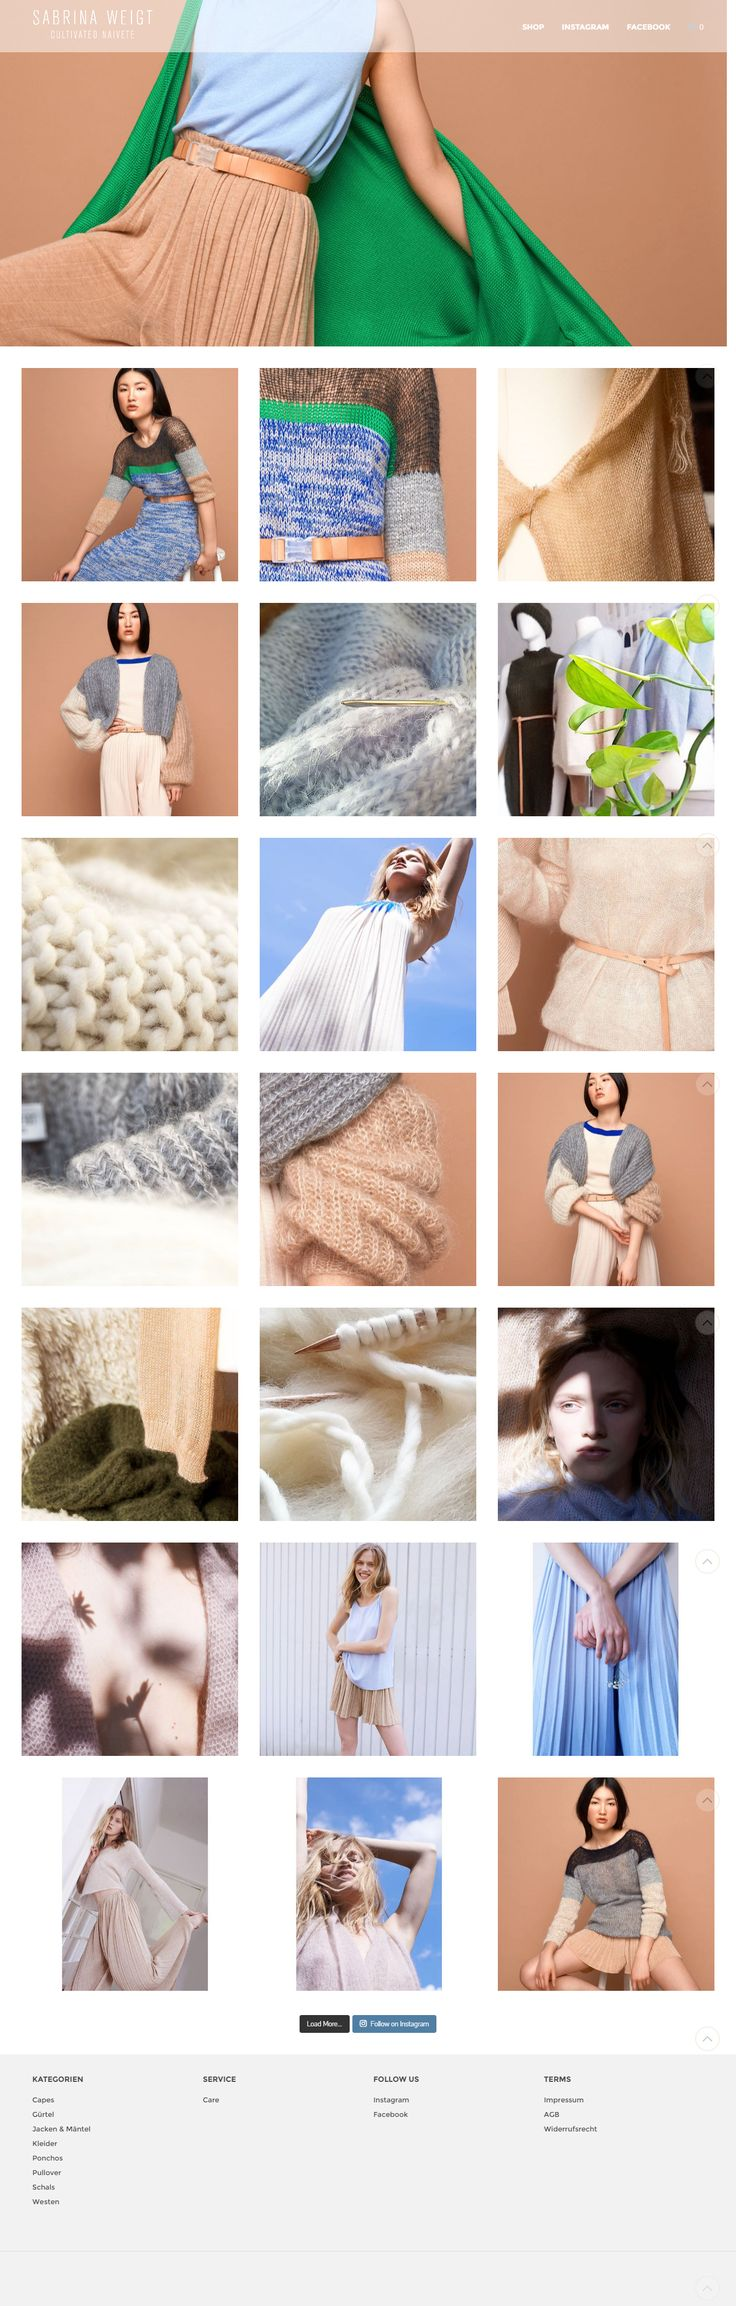 sabrina-weigt.de/, created with Shopkeeper WP theme  https://themeforest.net/item/shopkeeper-ecommerce-wp-theme-for-woocommerce/9553045?utm_source=pinterest.com&utm_medium=social&utm_content=sabrina-weigt&utm_campaign=showcase #wordpress #websites #design #shop #knitwear